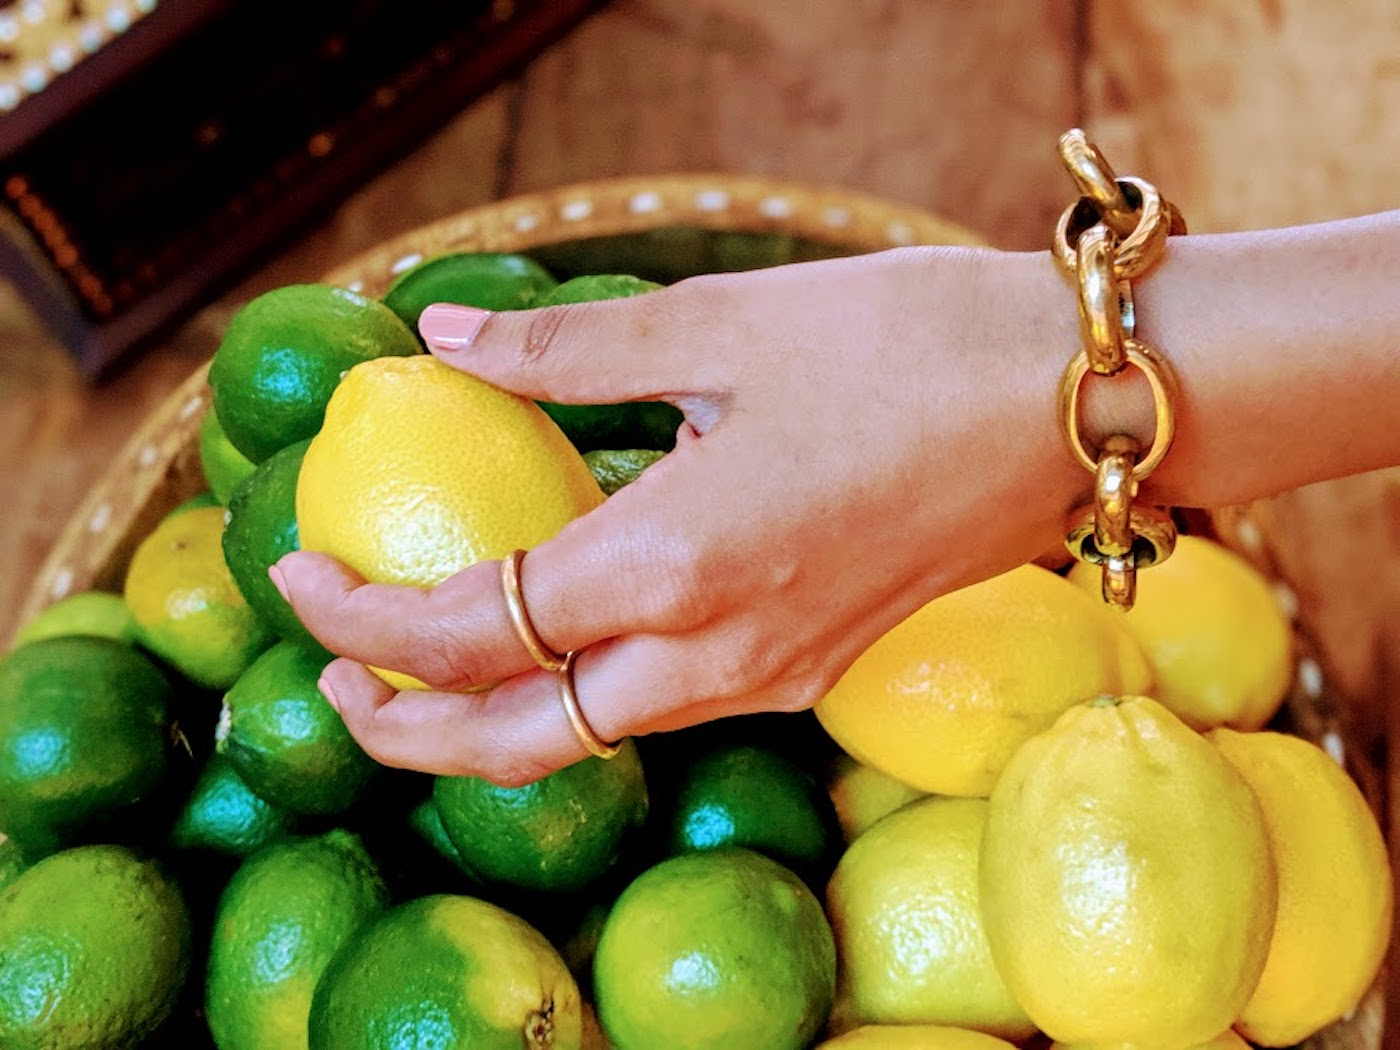 Chetna Bhatt of Ashepa Lifestyle wears the Zulu bracelet and Classic brass rings.